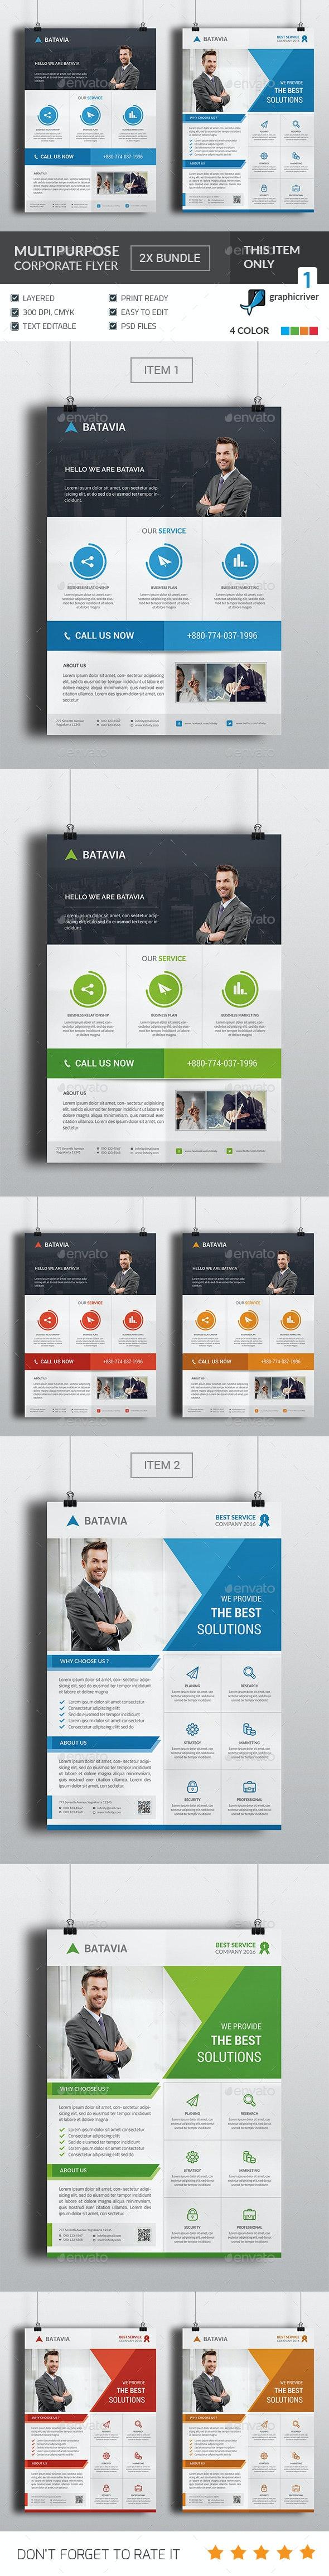 Multipurpose Corporate Flyer Bundle - Flyers Print Templates